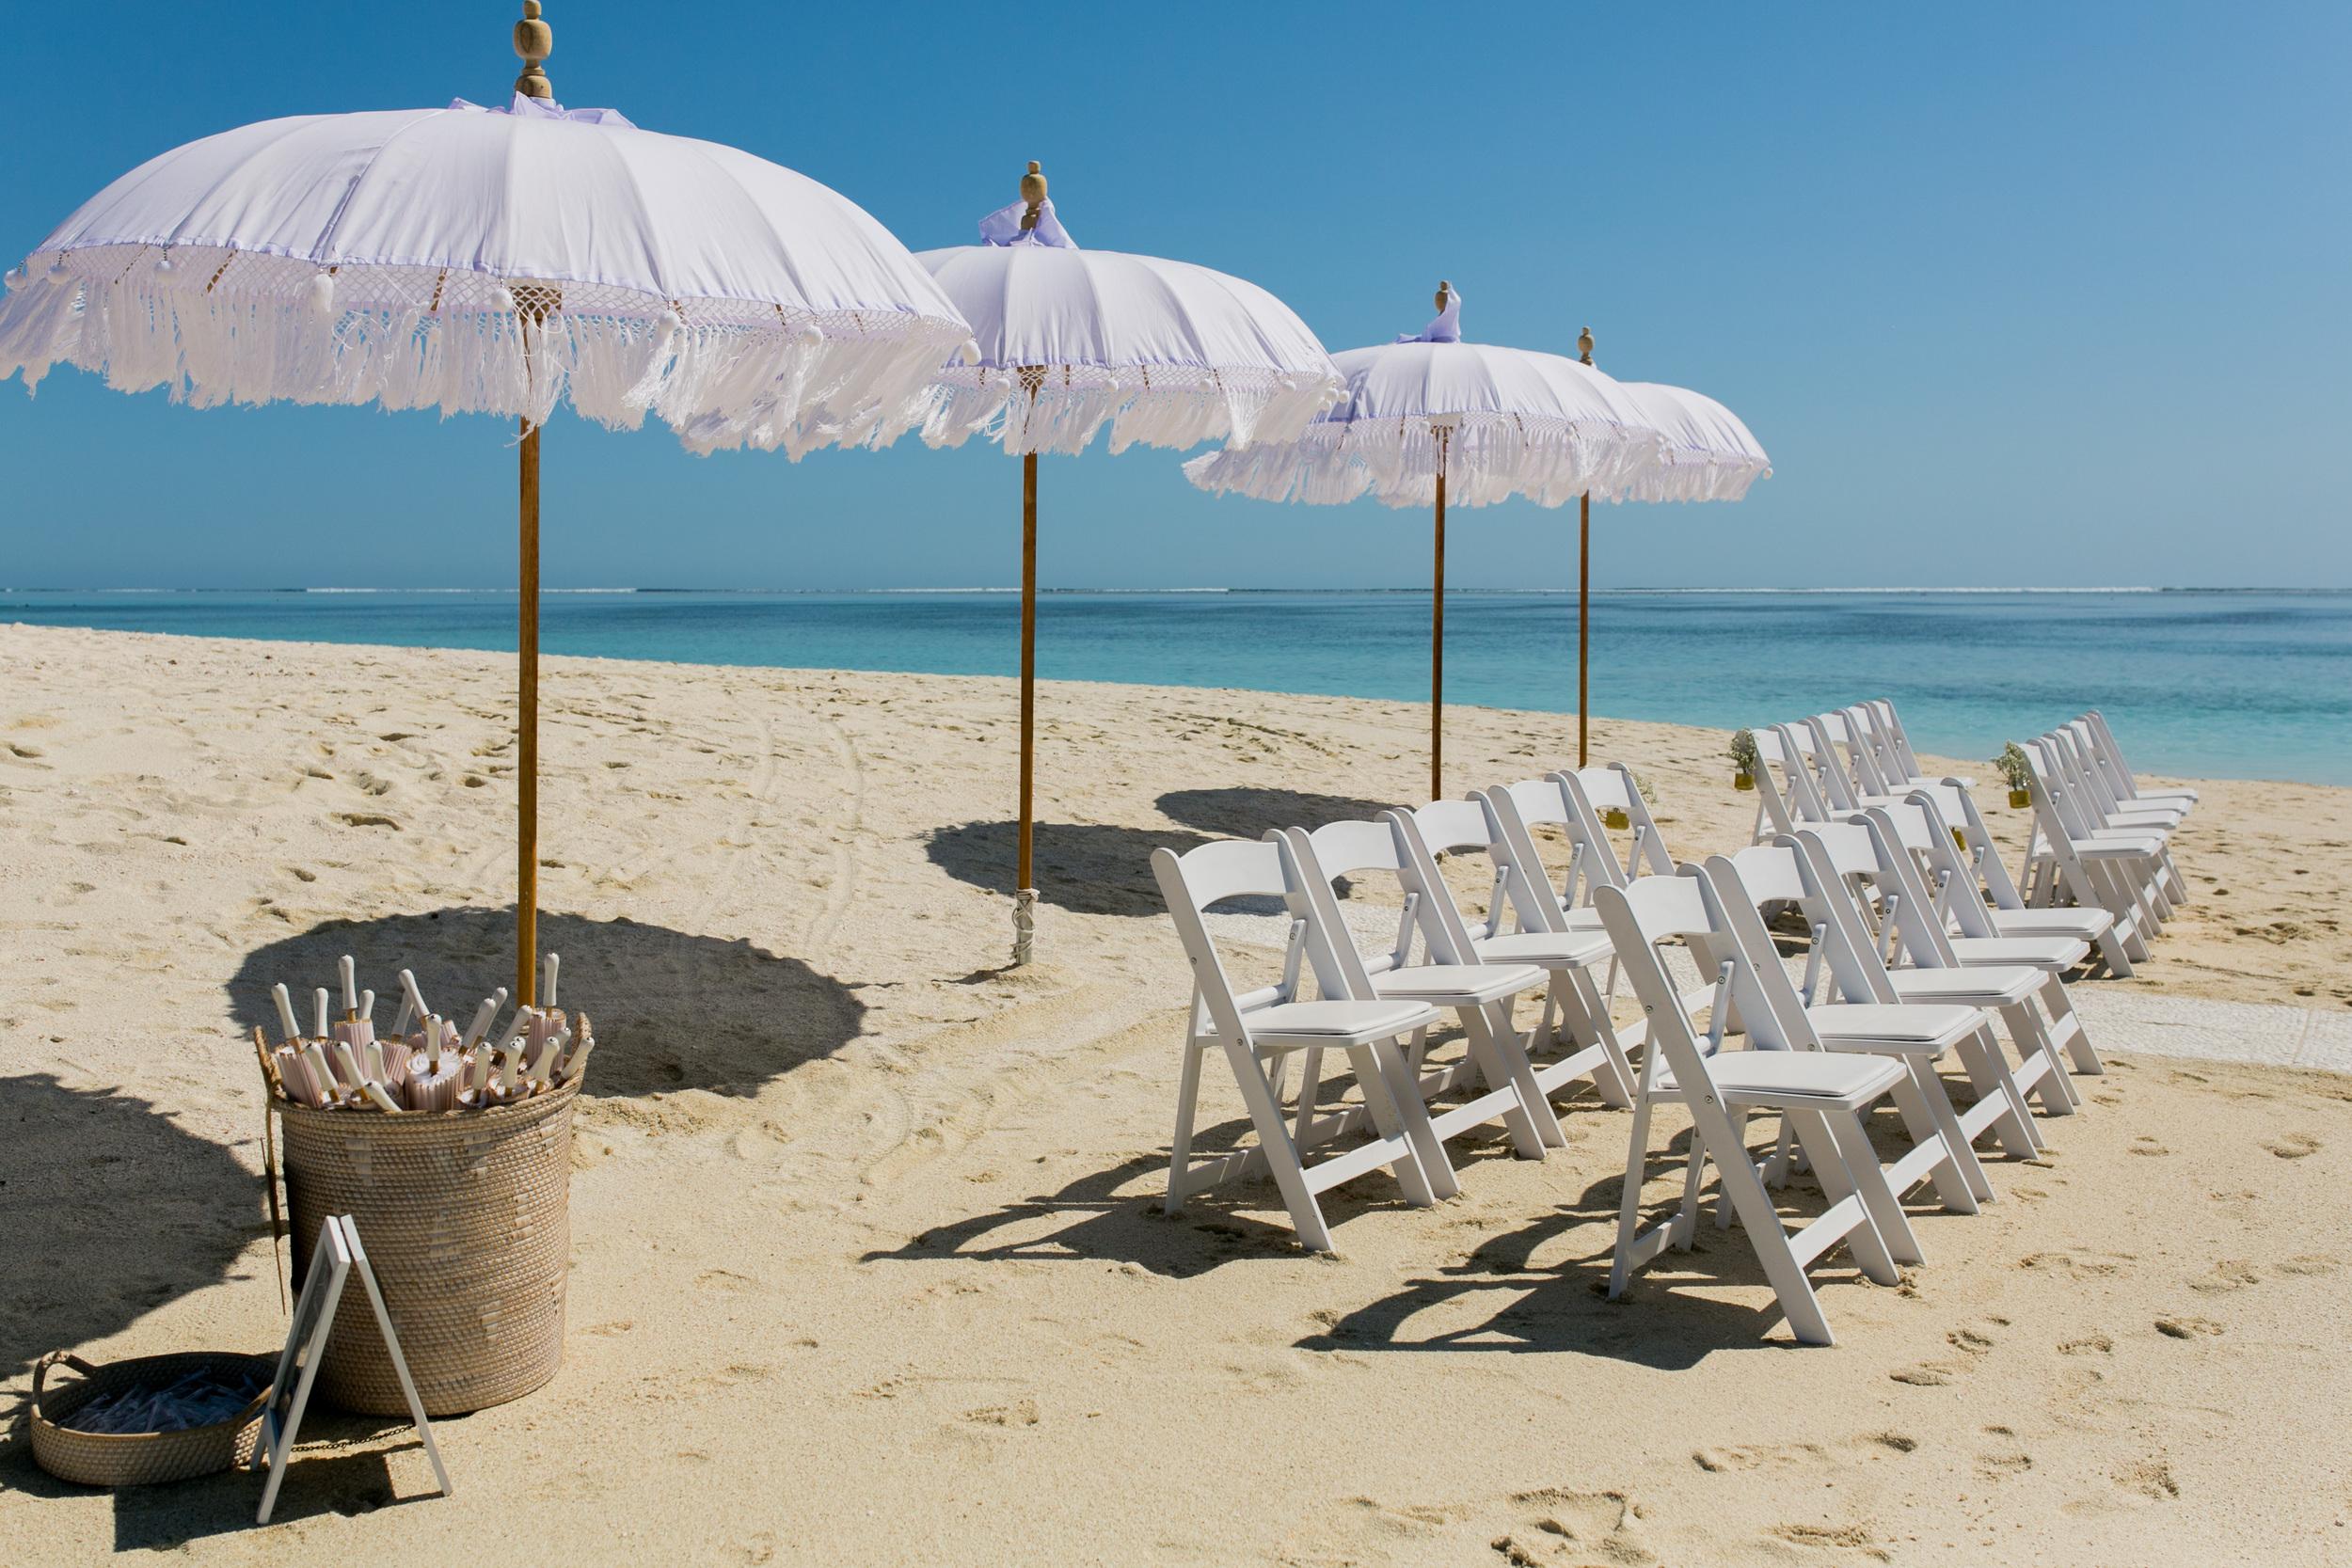 Bohemian Umbrellas & Gladiator Chairs